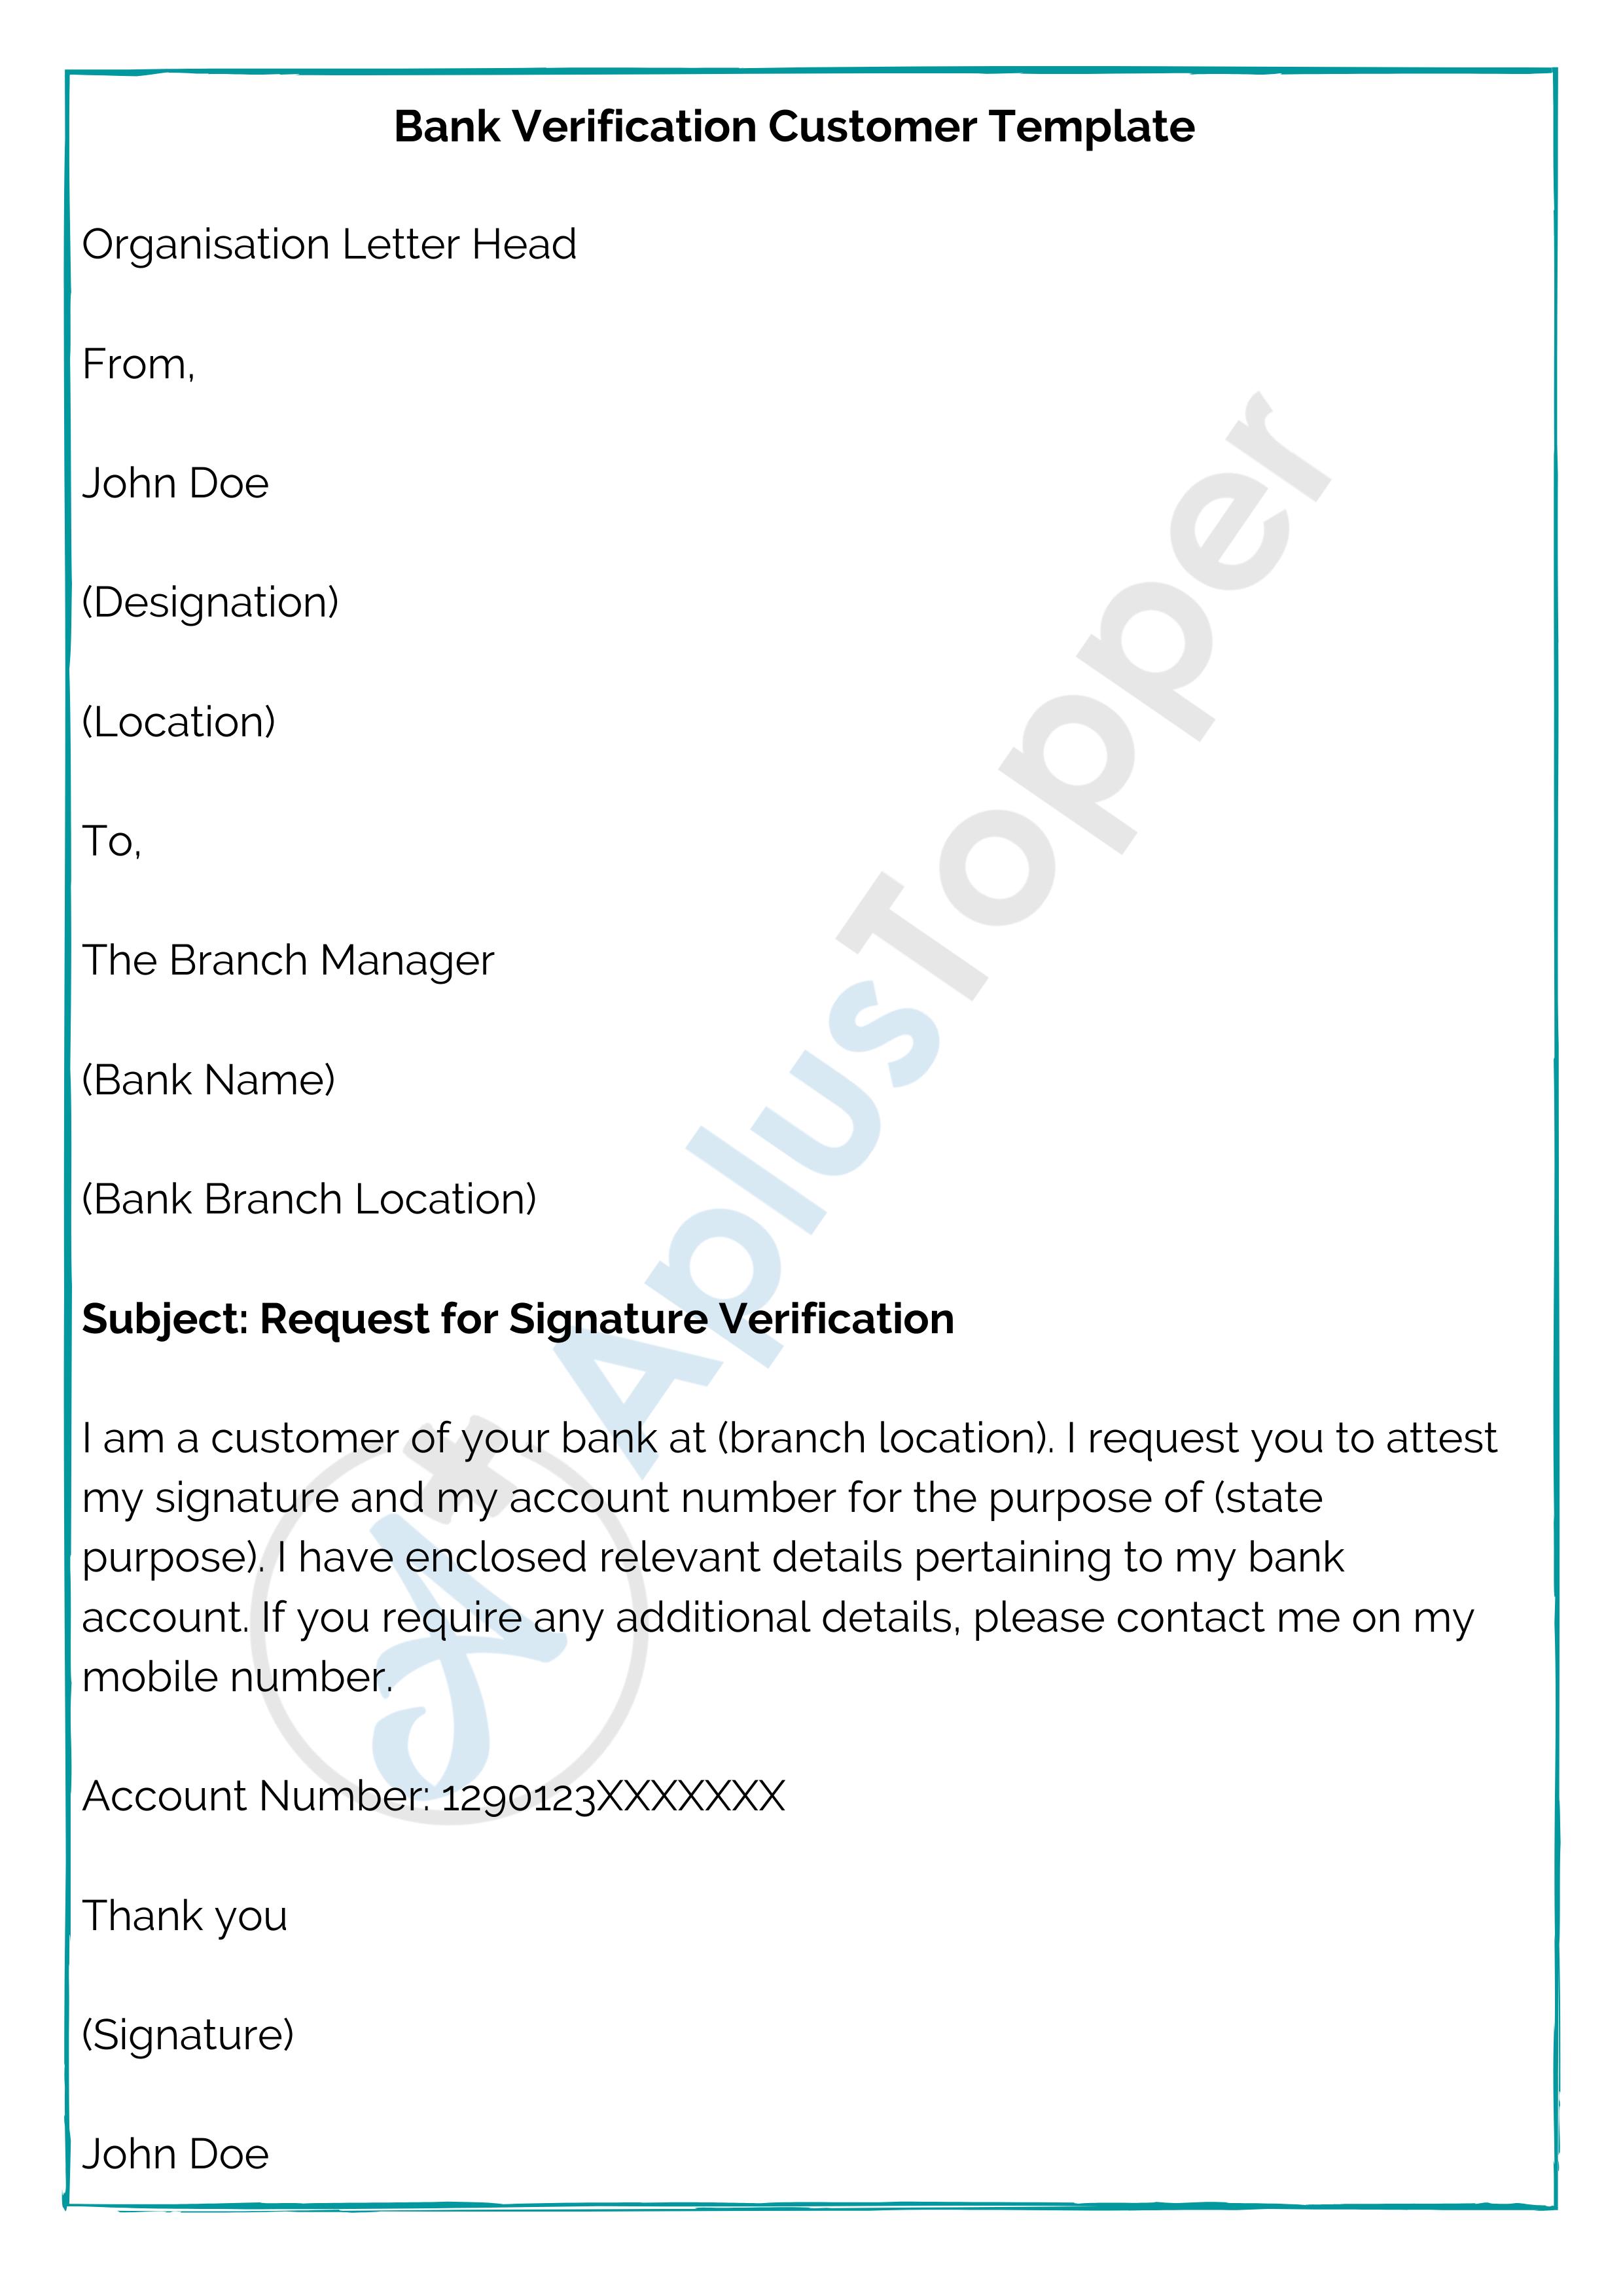 Bank Verification Customer Template